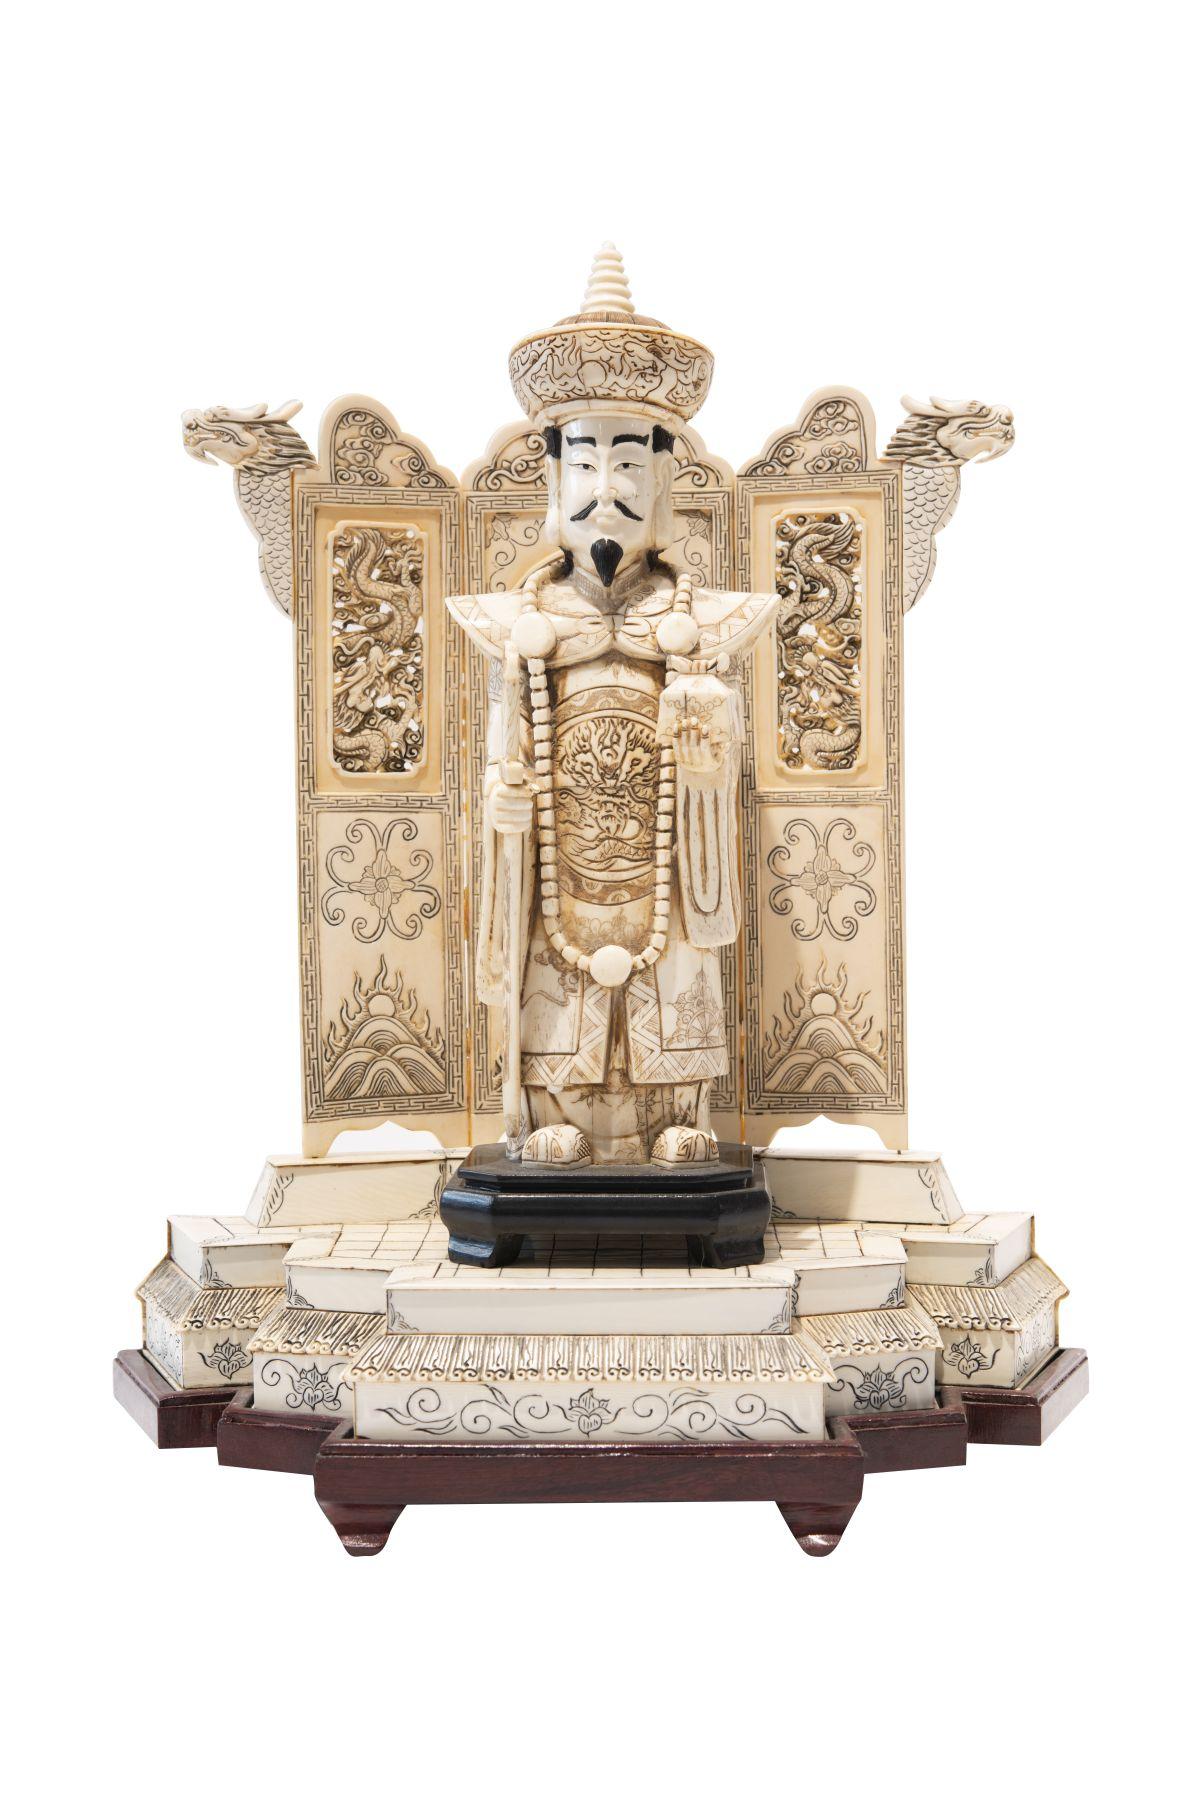 #8 Ruler of china ivory | Herrscher China Elfenbein Image